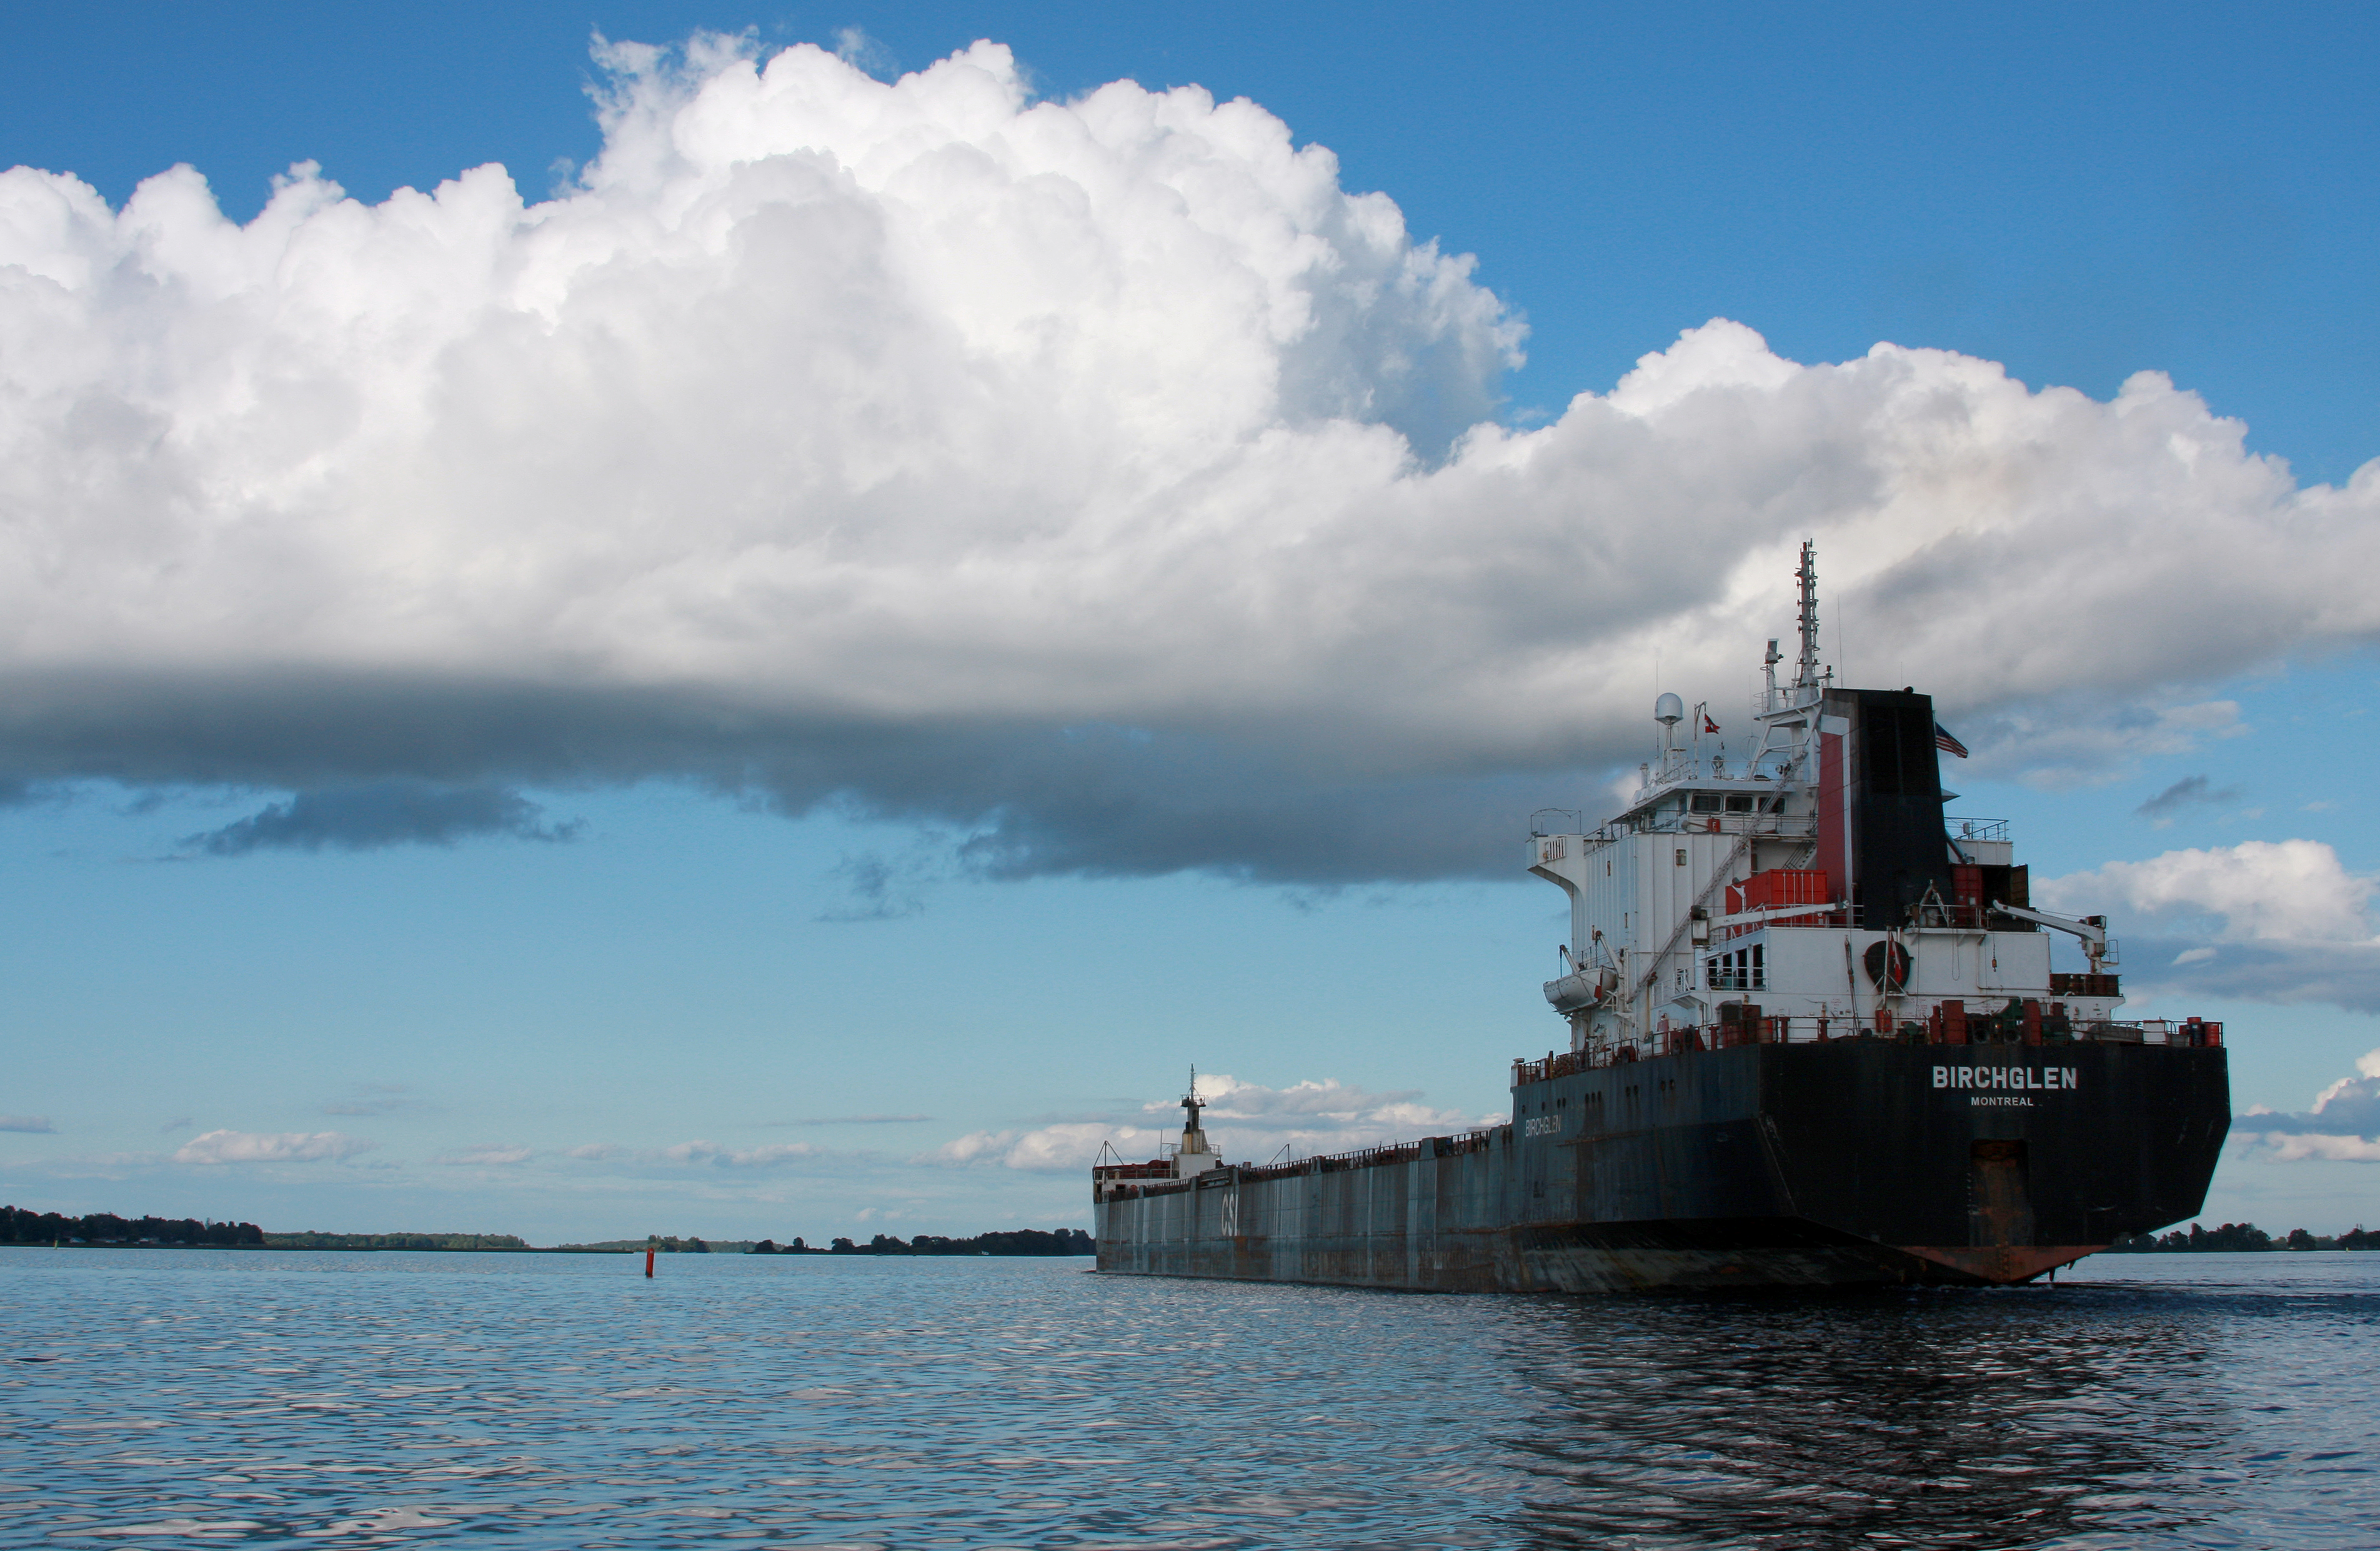 File:Freight Ship Birchglen.jpg - Wikimedia Commons